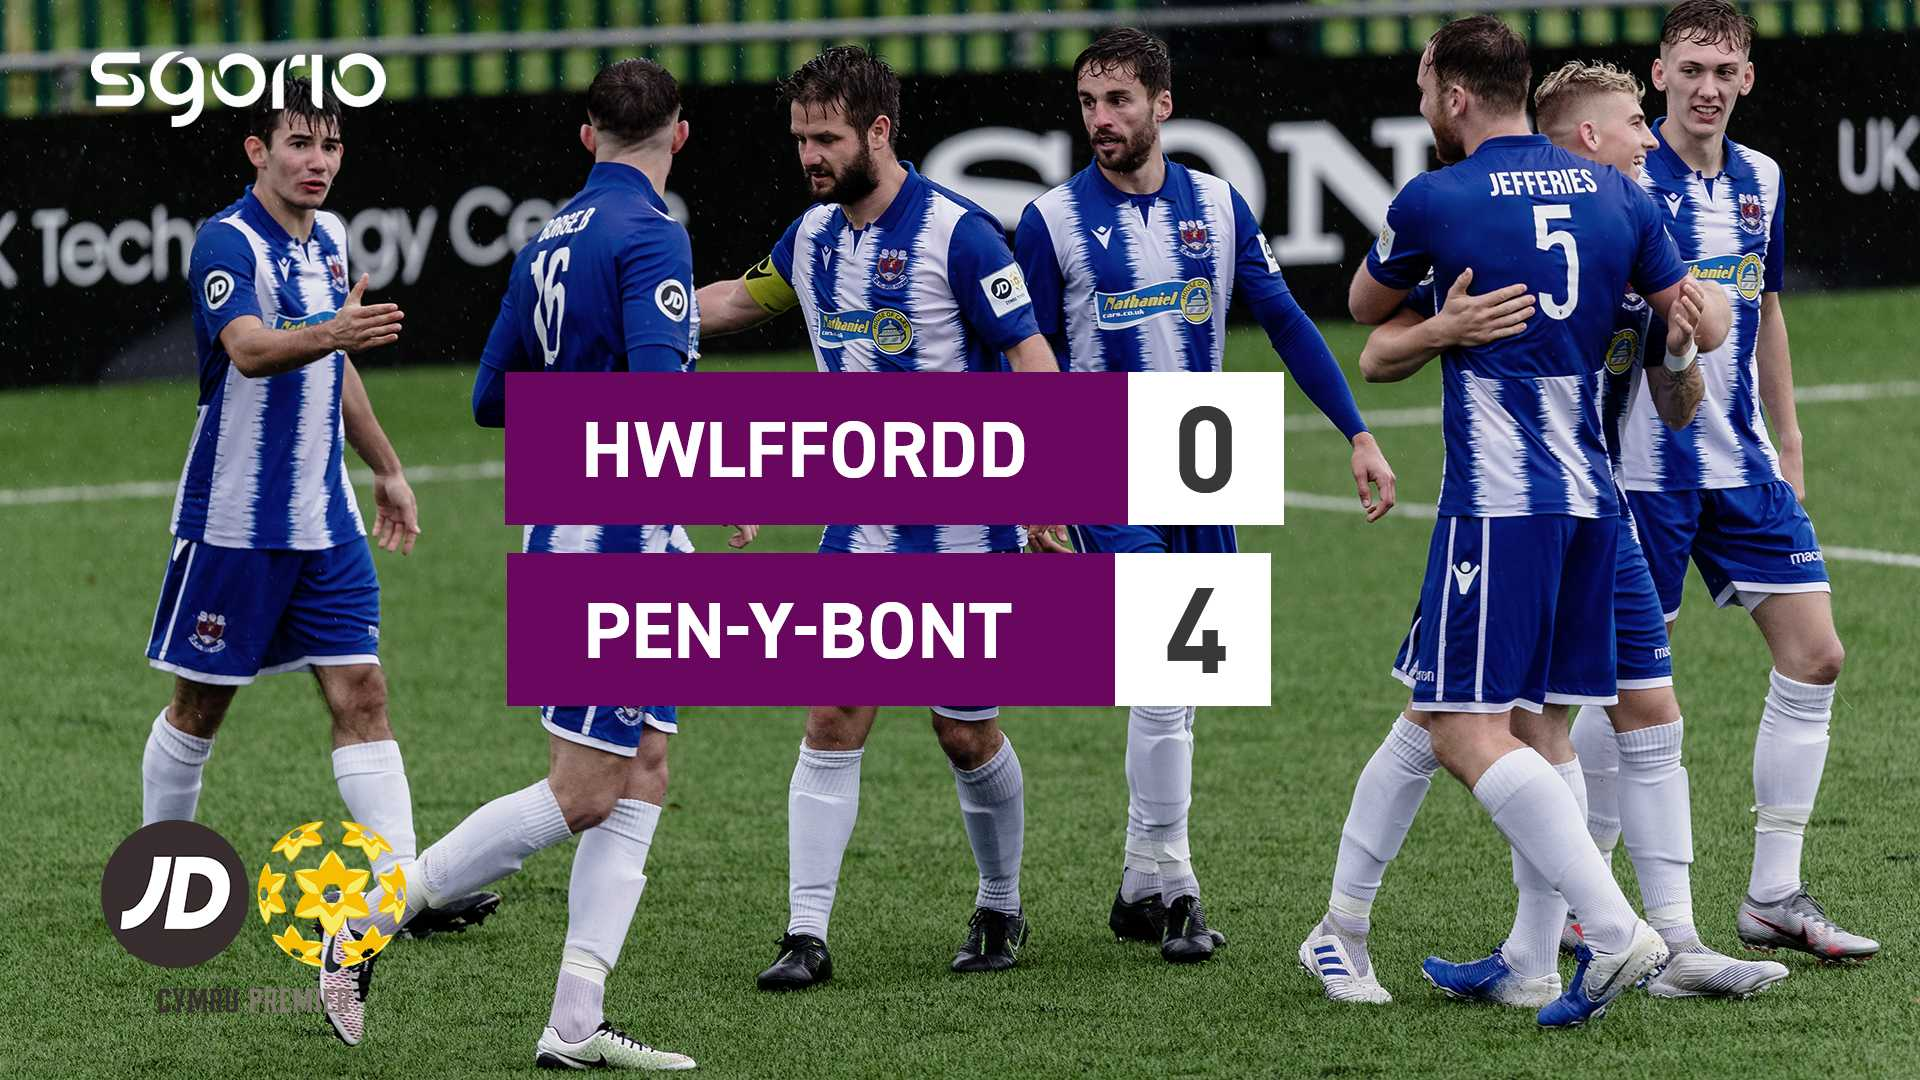 Hwlffordd 0–4 Pen-y-bont